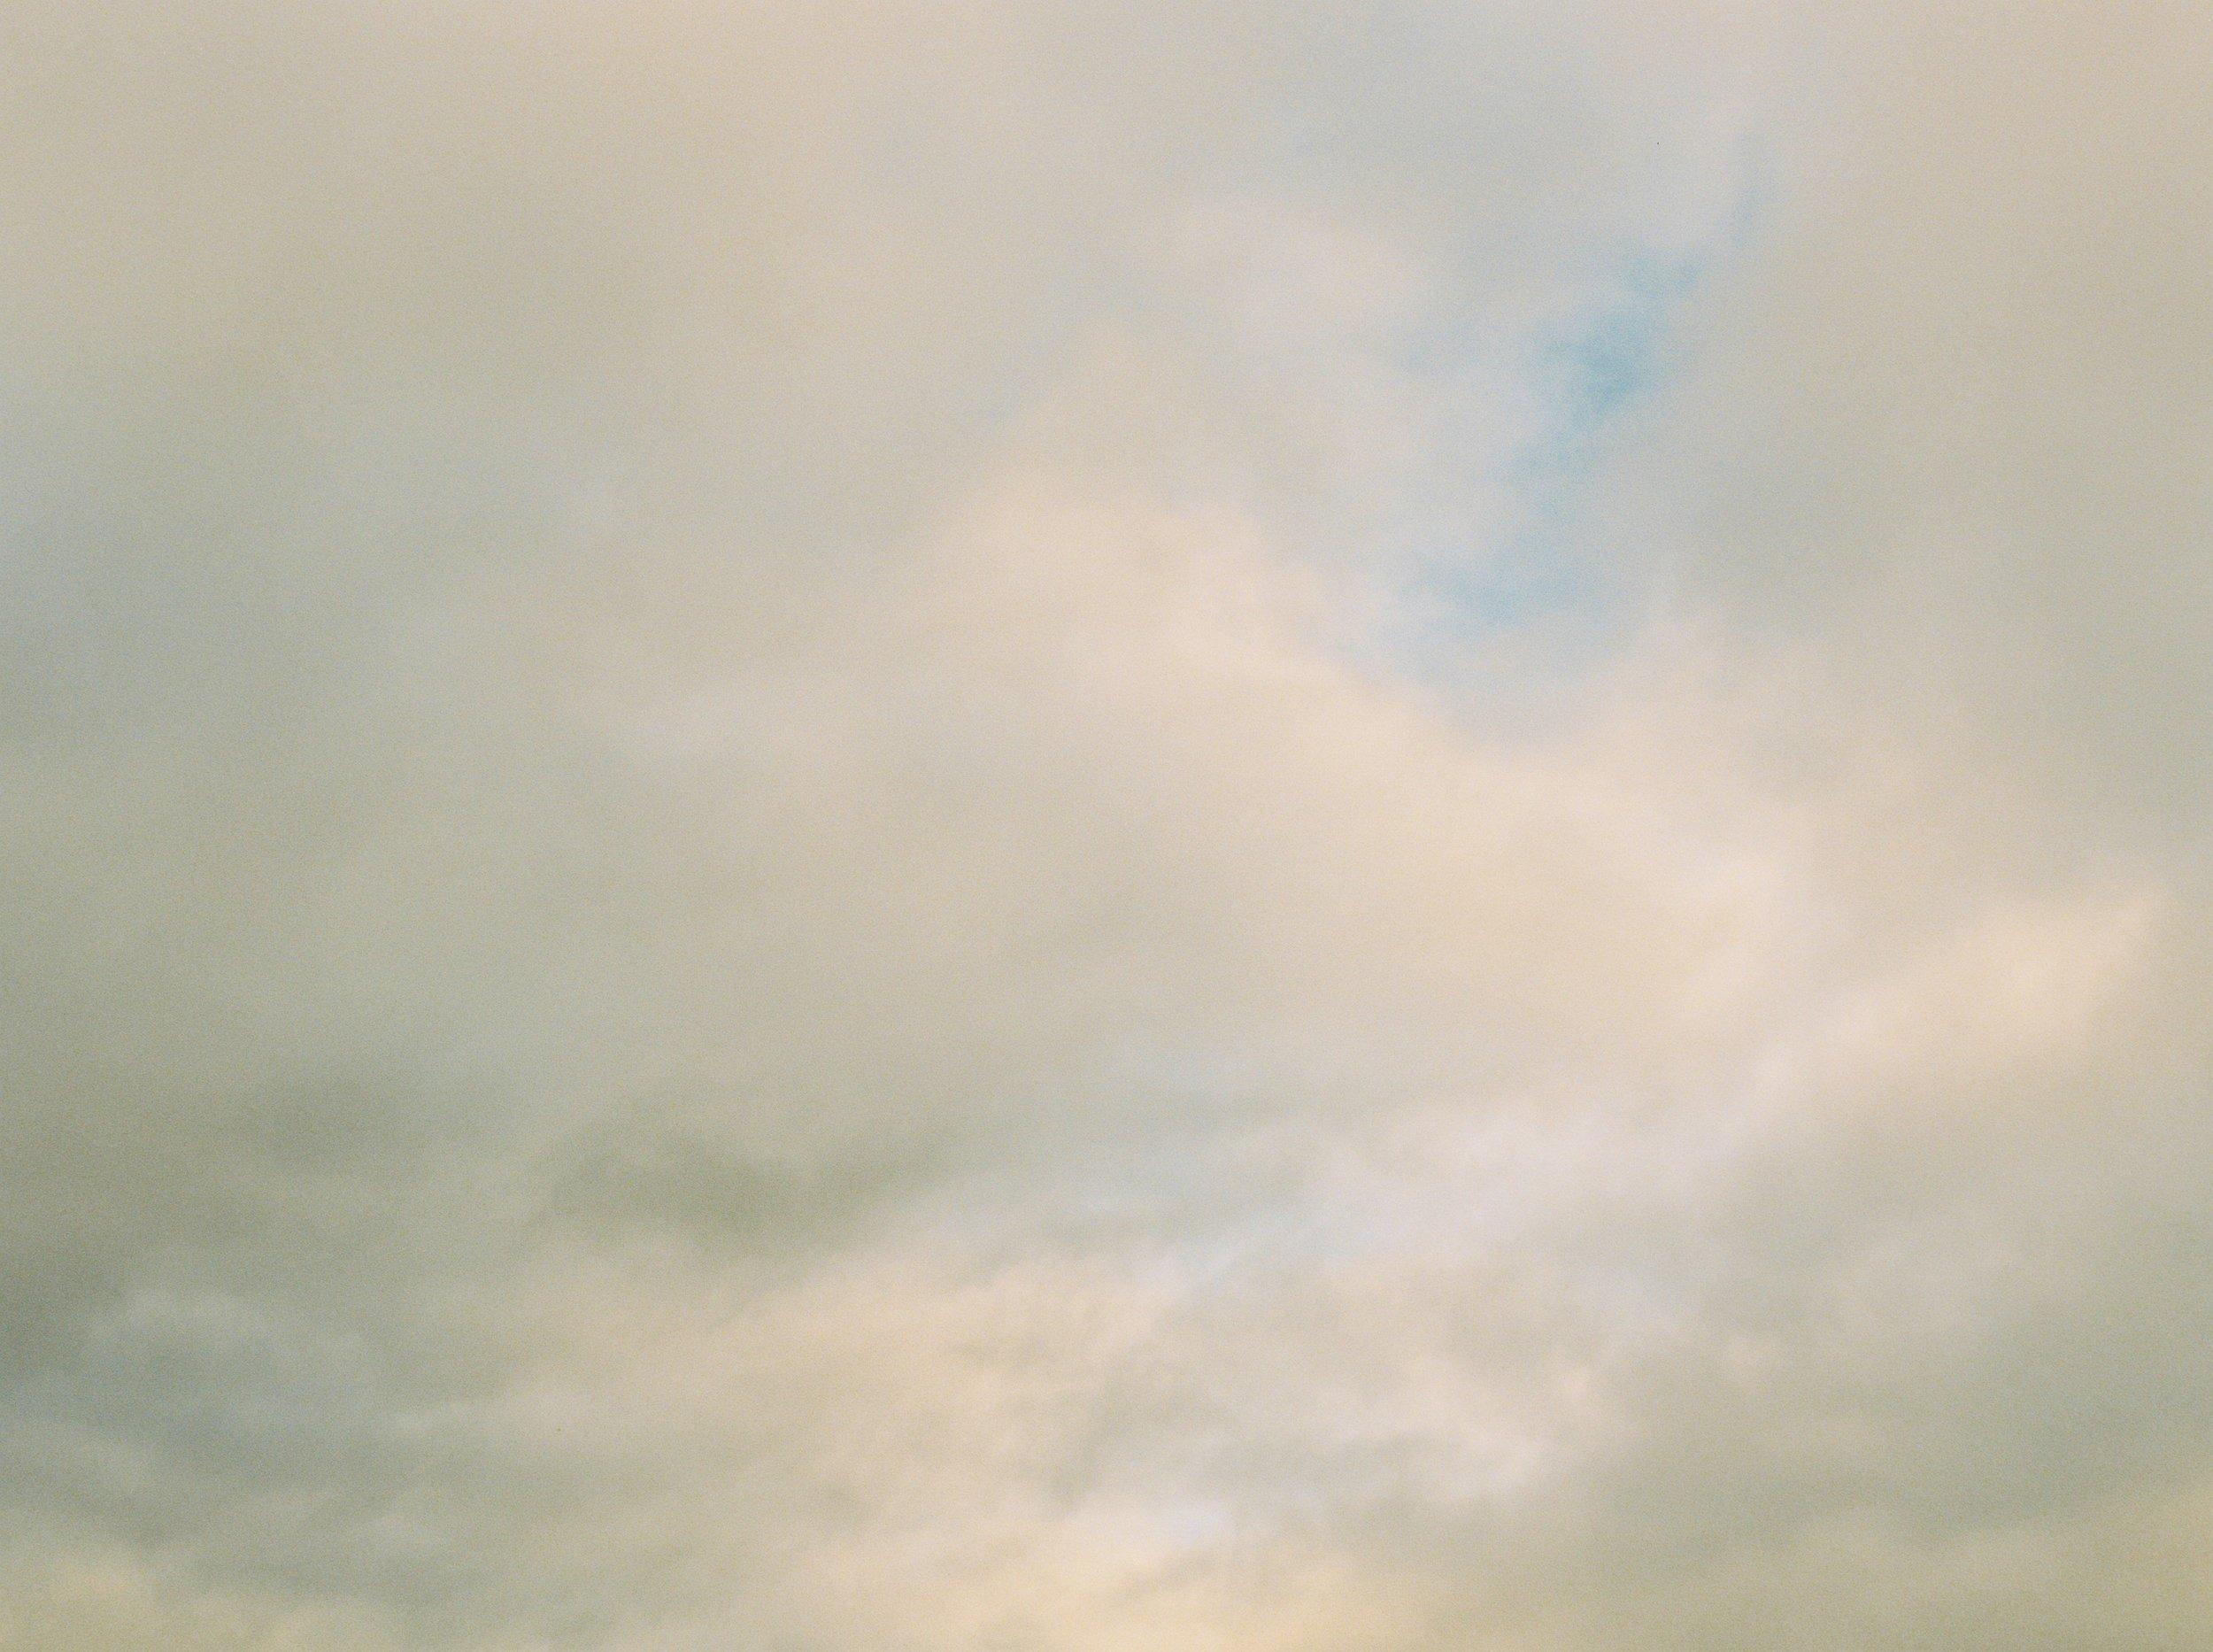 clouds_cloud_film_photographer_emily_walker_15.jpg